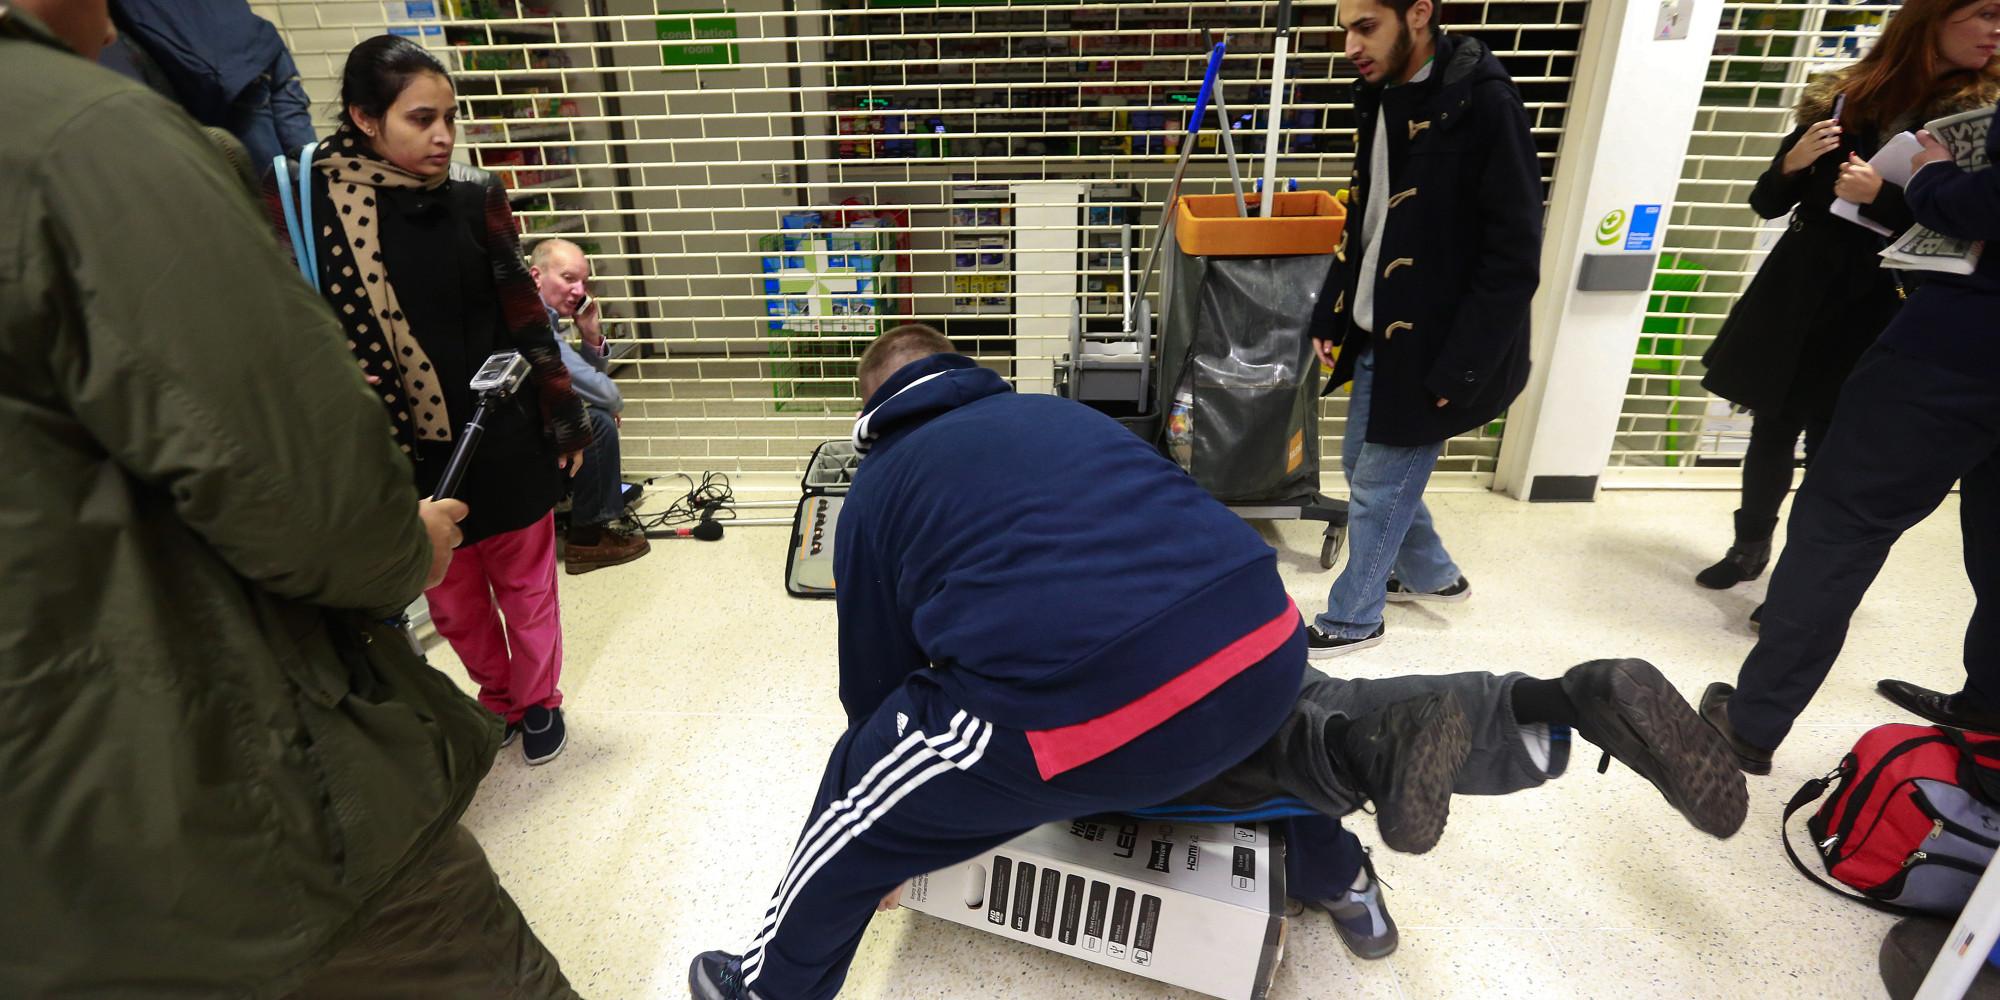 Wal-Mart Stores Inc.'s U.K. Asda Supermarket Entices Shoppers With Black Friday Deals